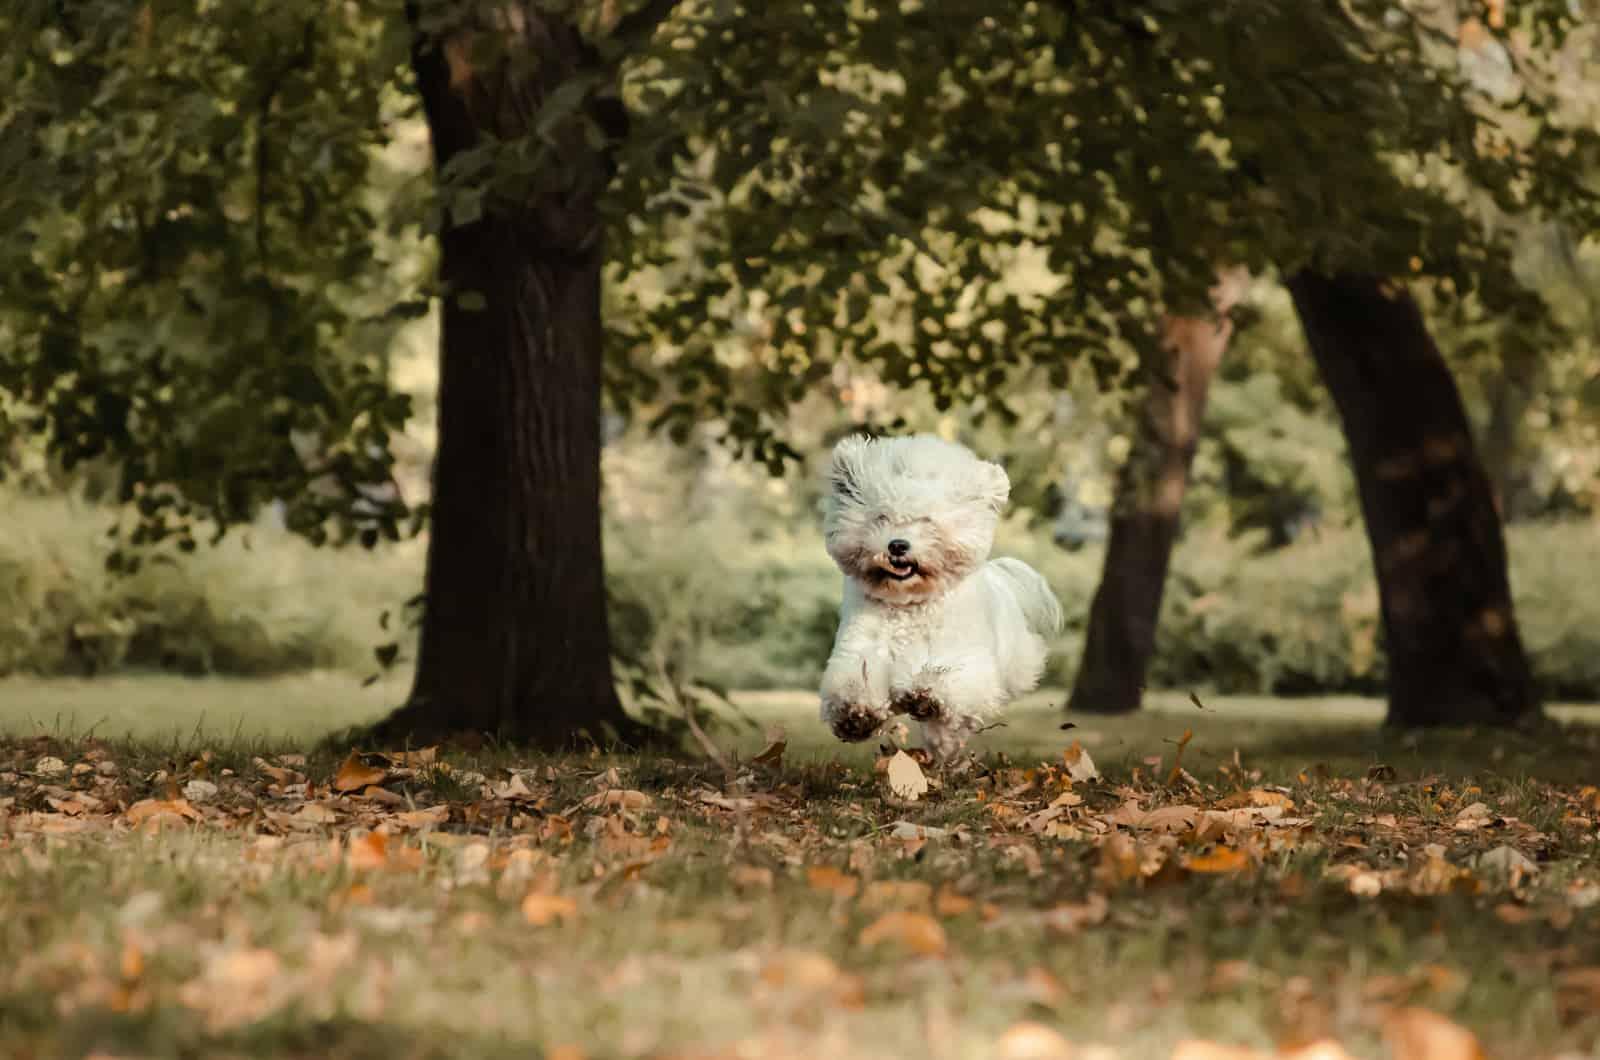 bichon frise running through park